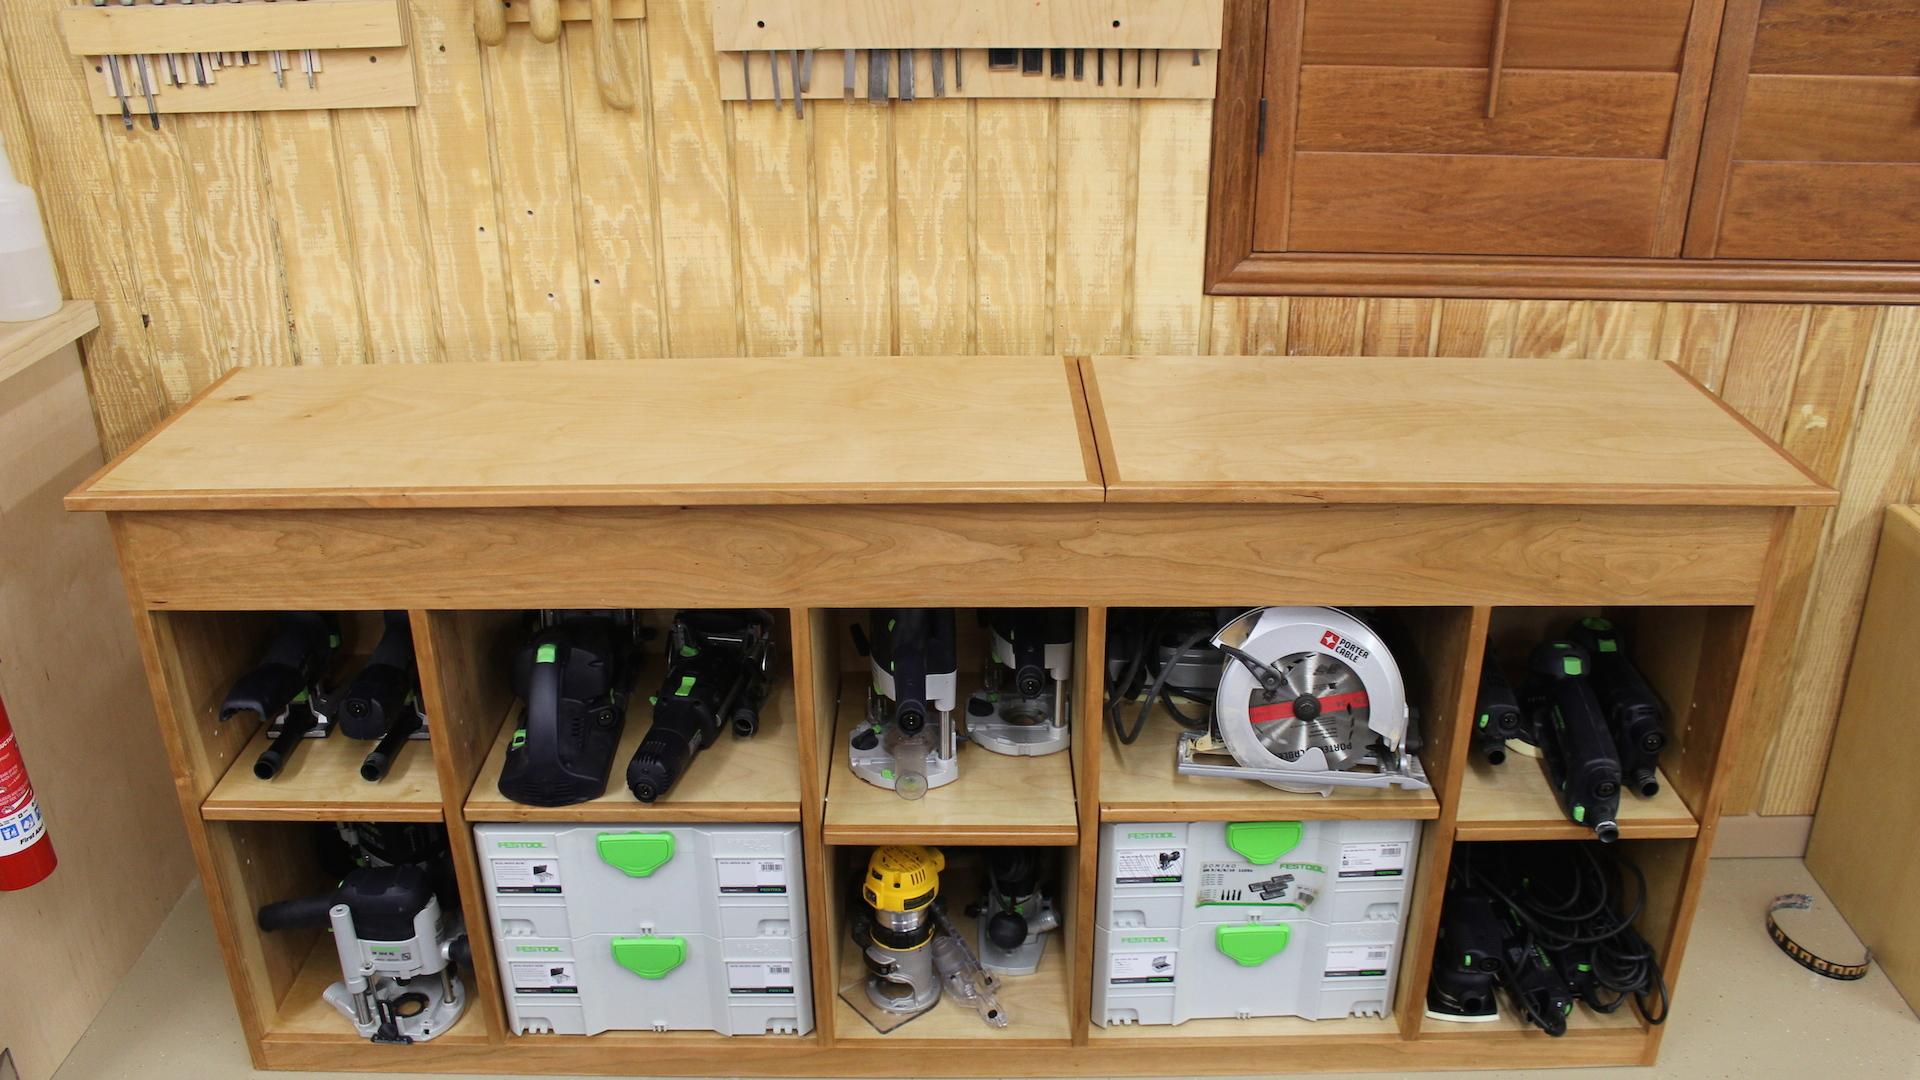 Tools Strorage Cabinet